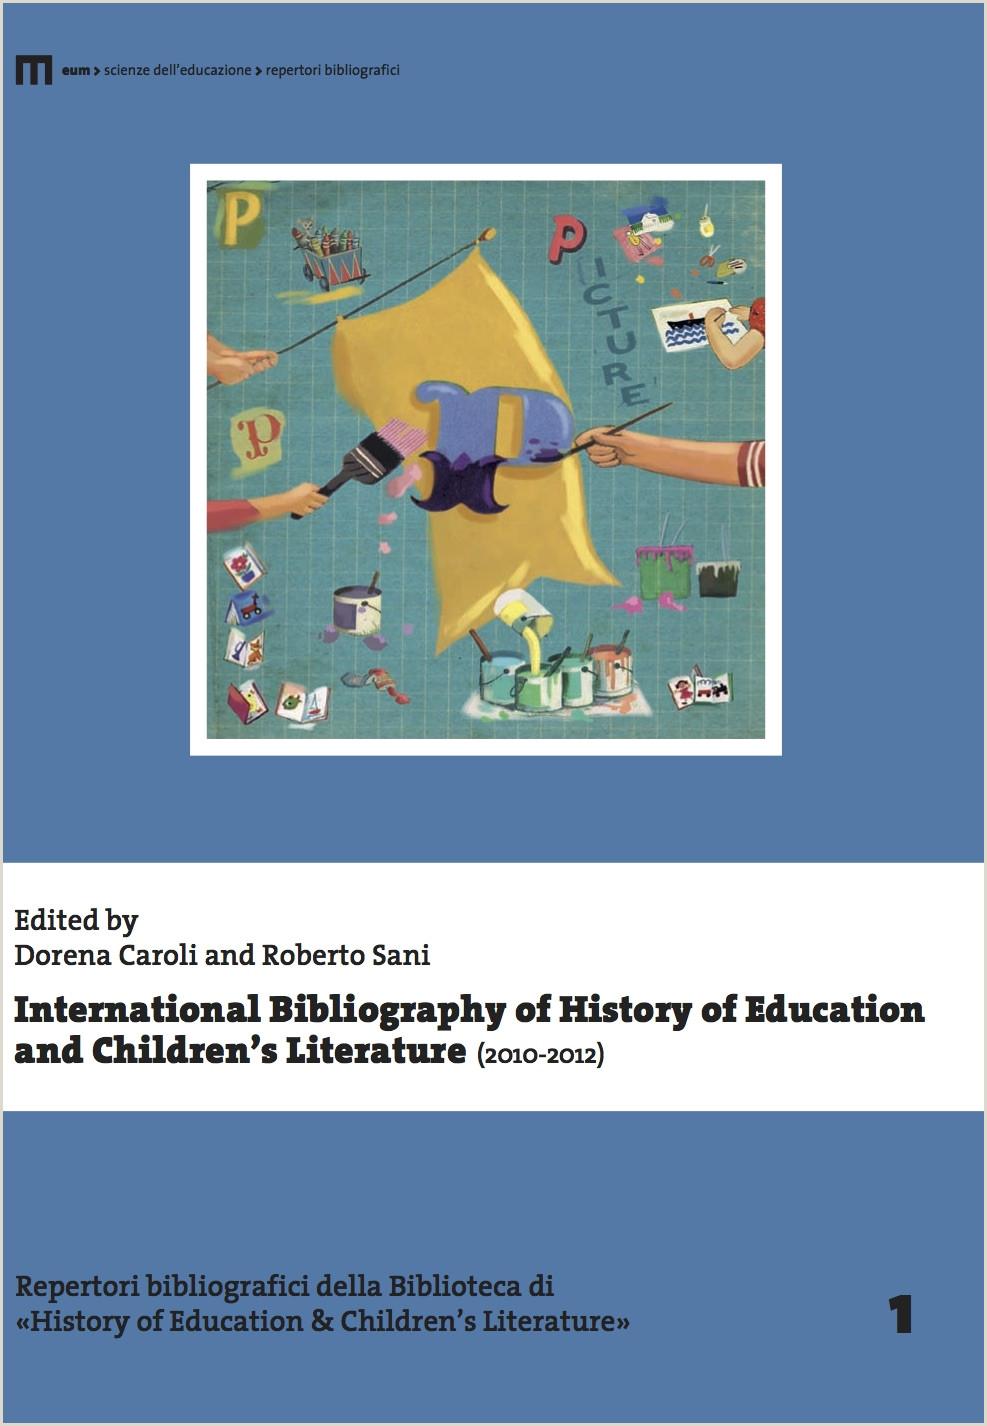 Hoja De Vida Minerva 1003 Colombia Caroli D & Sani L Eds International Bibliography Of